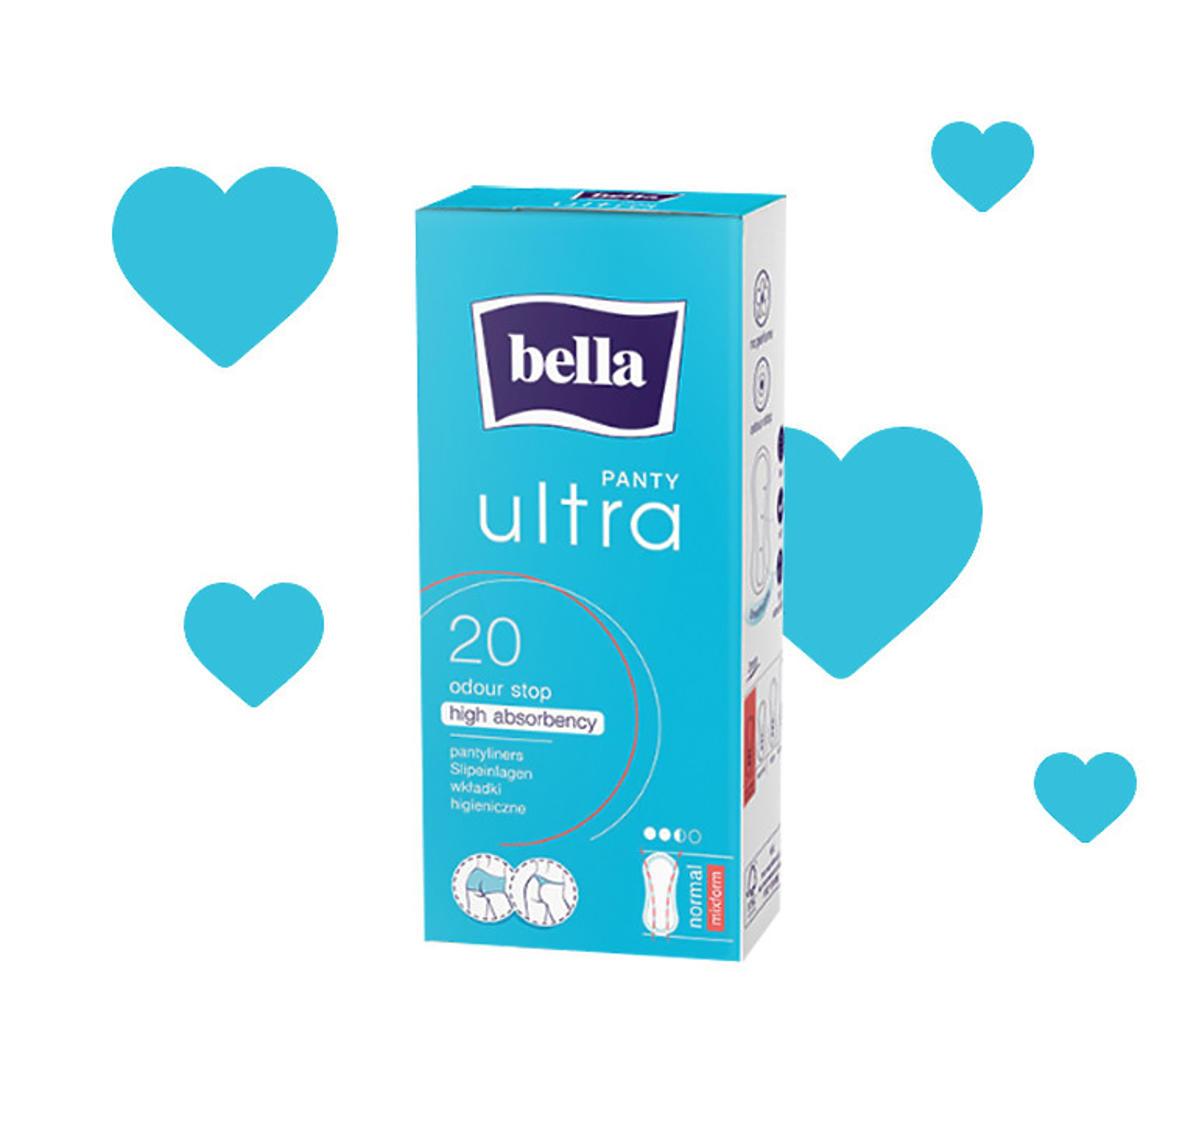 bella-panty-ultra